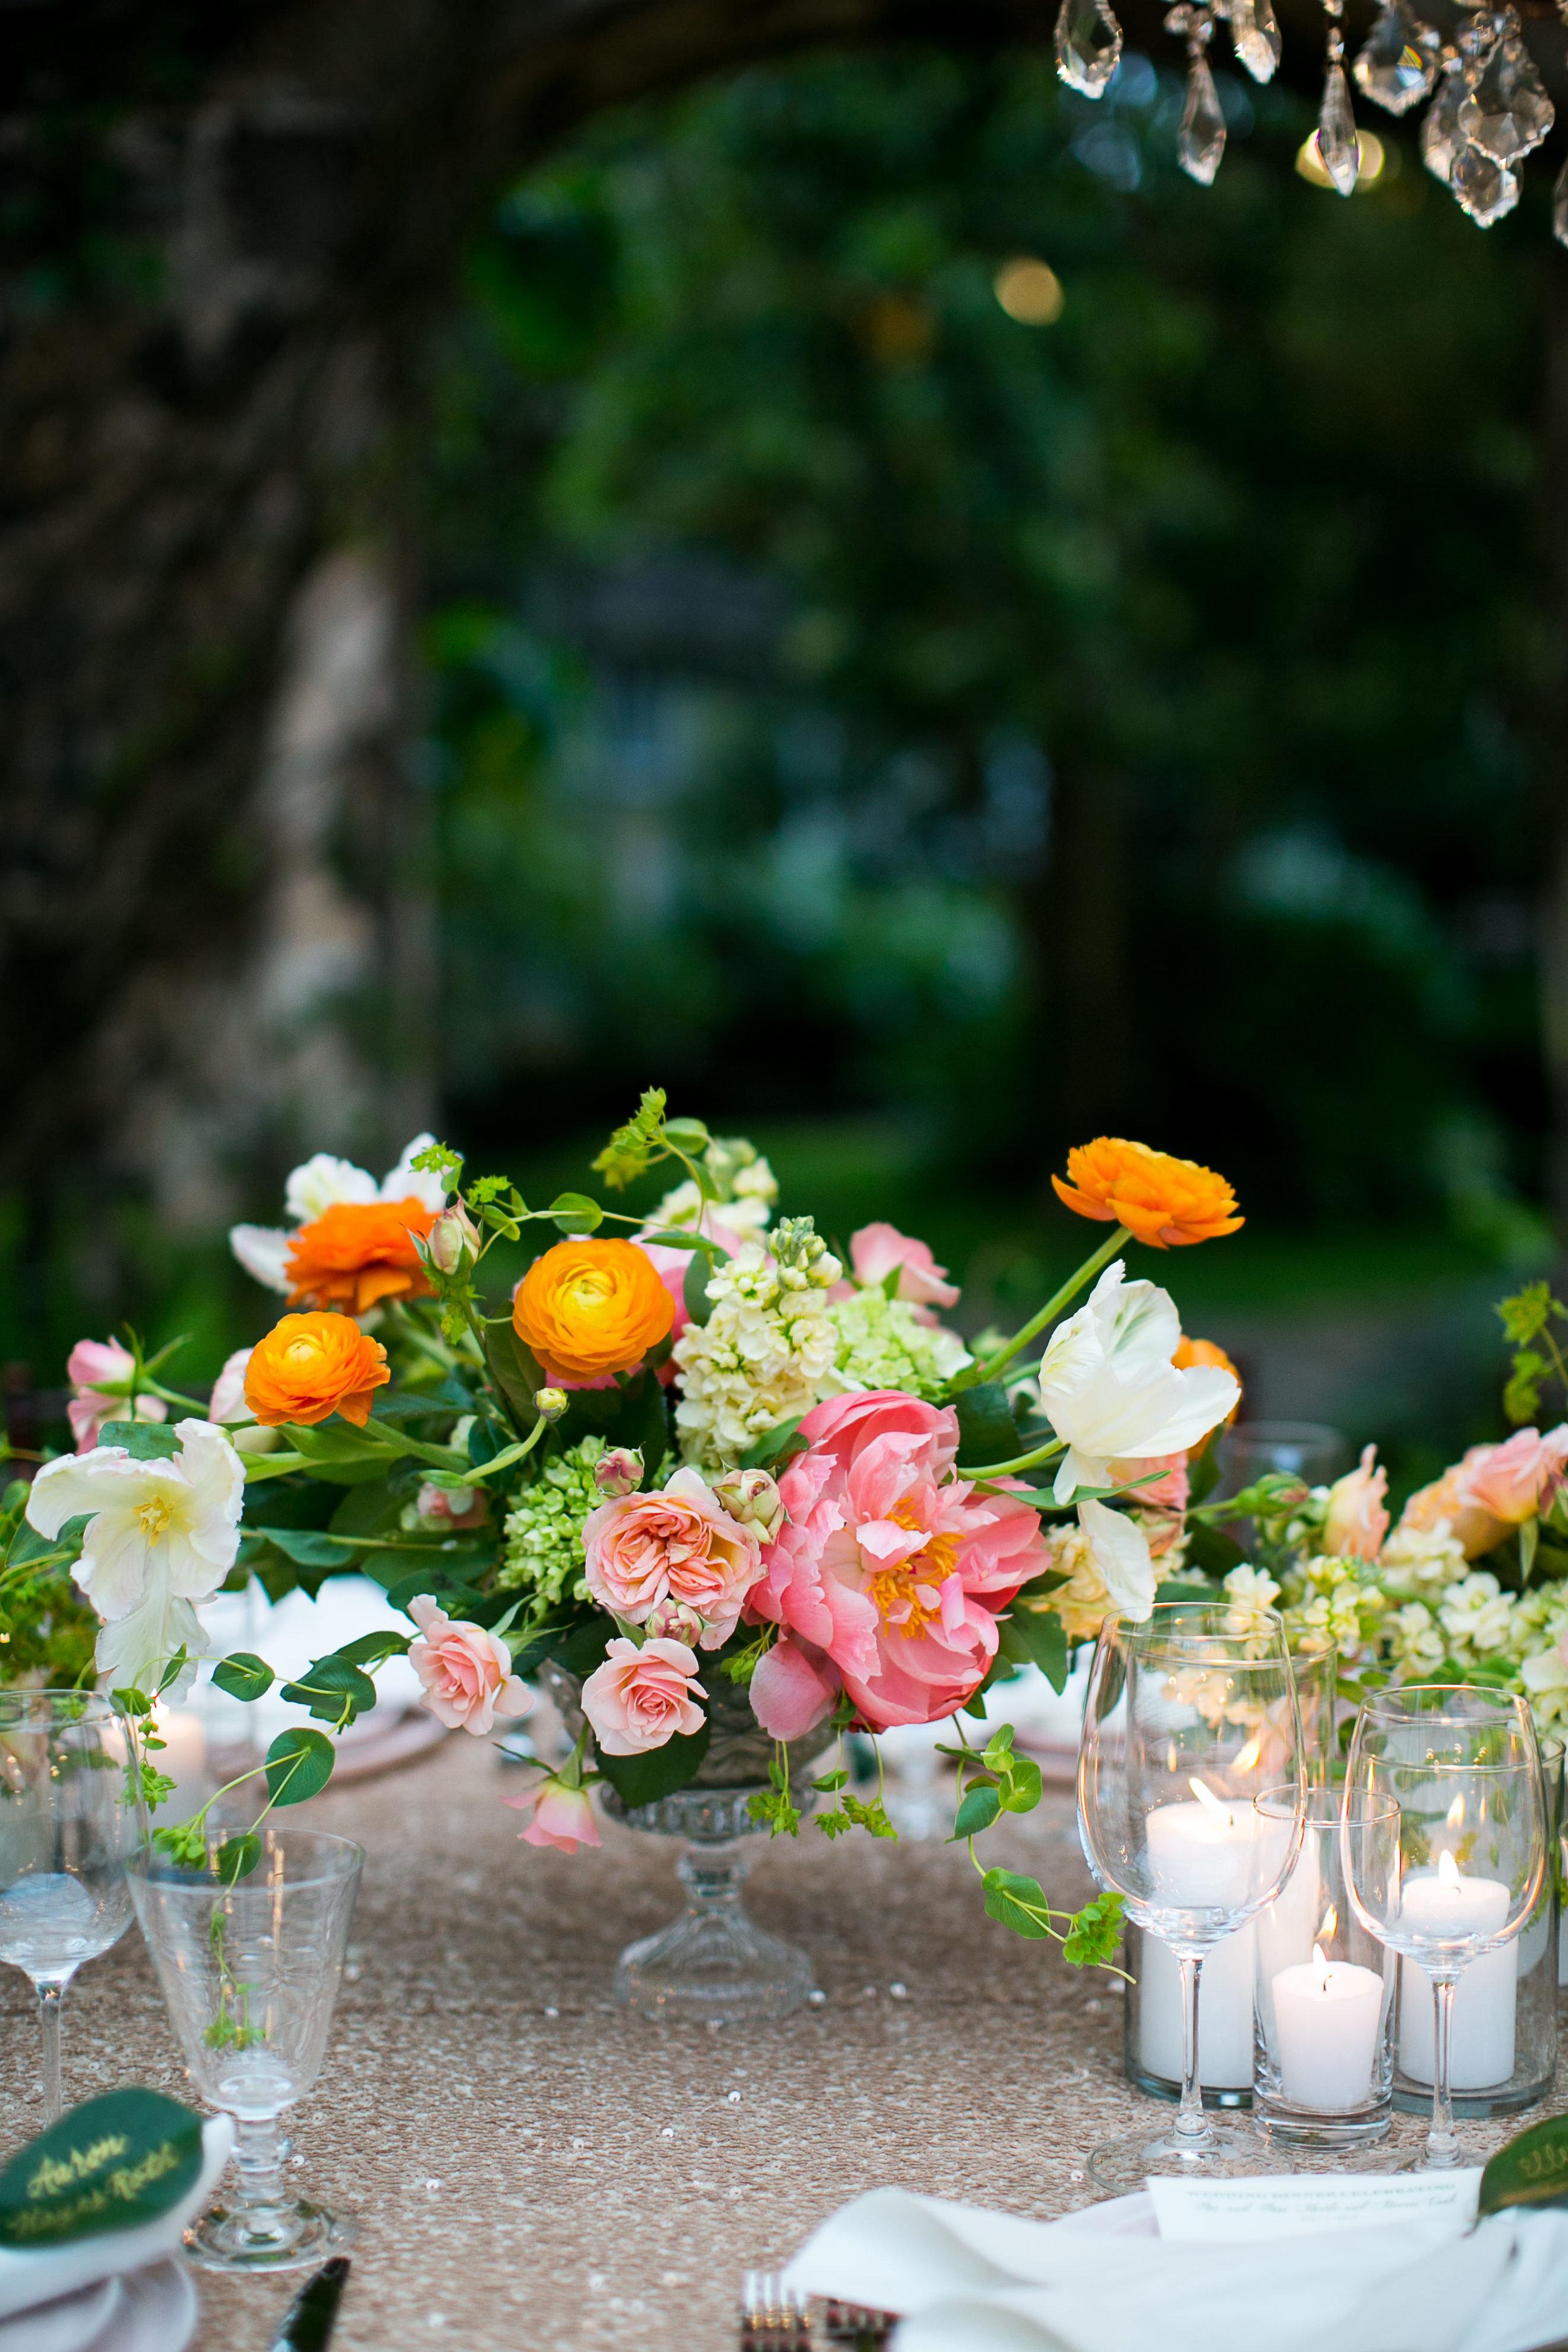 160507-Shaila-Wedding-4437.jpg